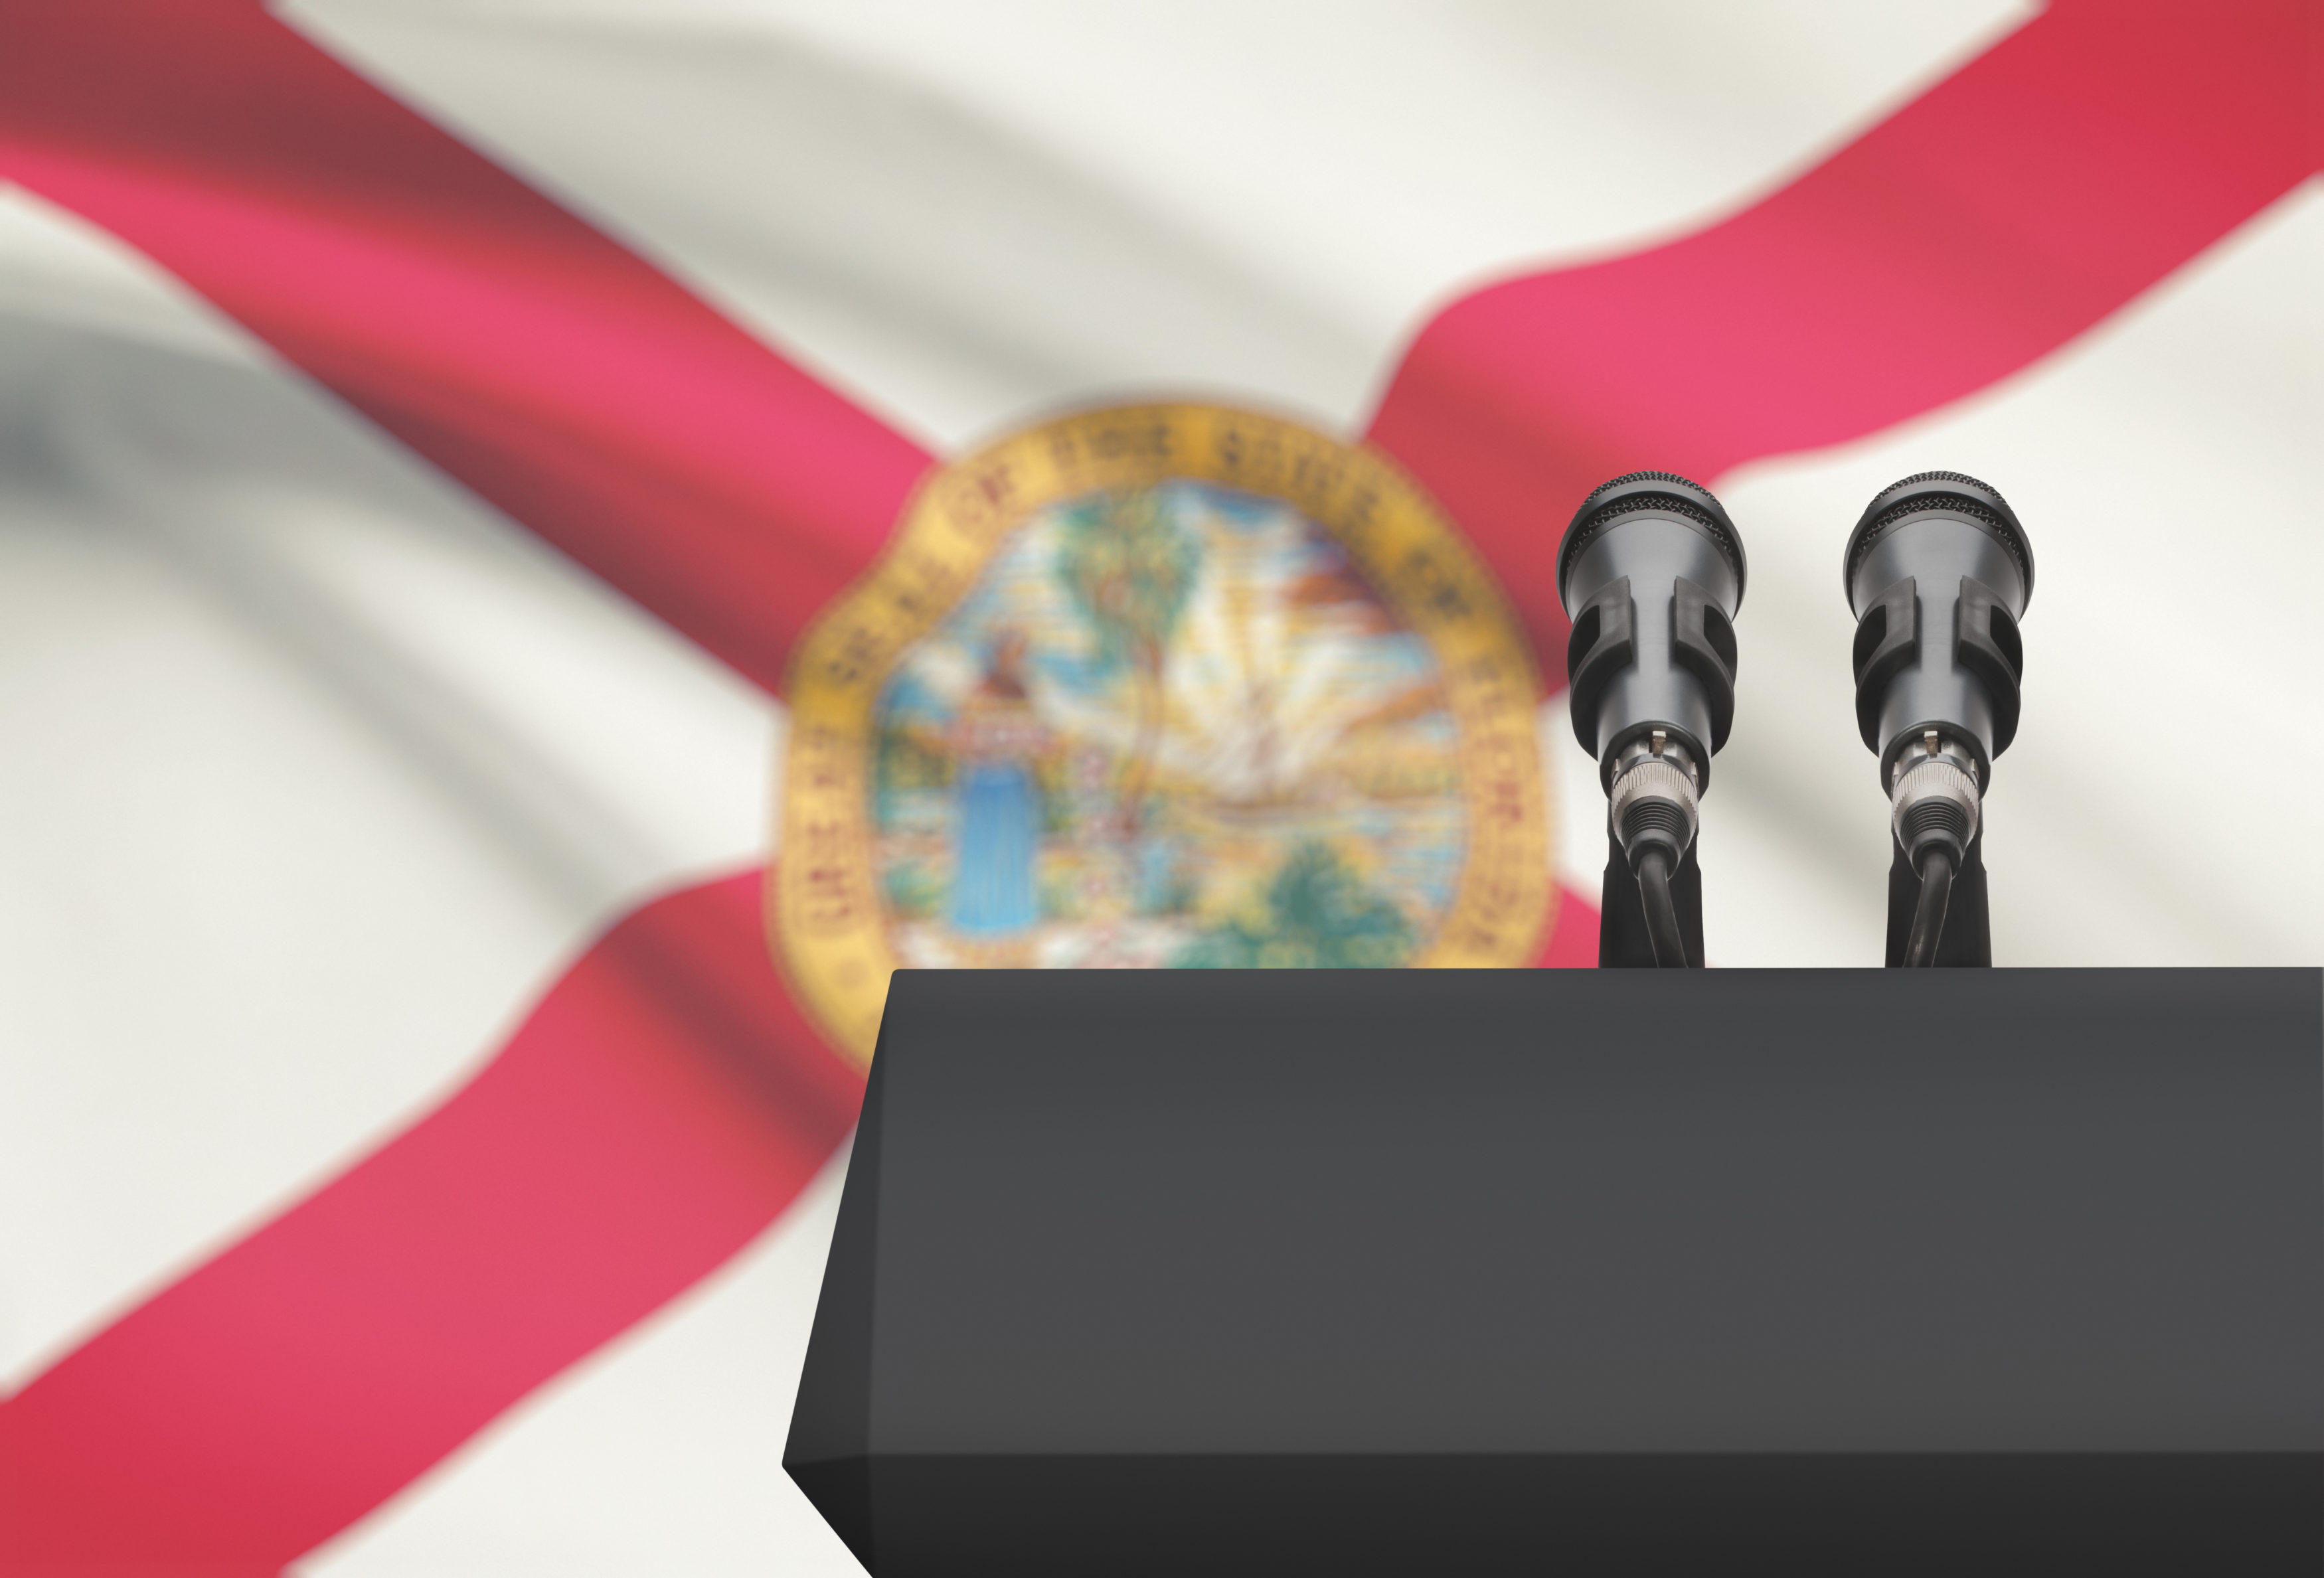 florida-political-debate-3500x2377.jpeg